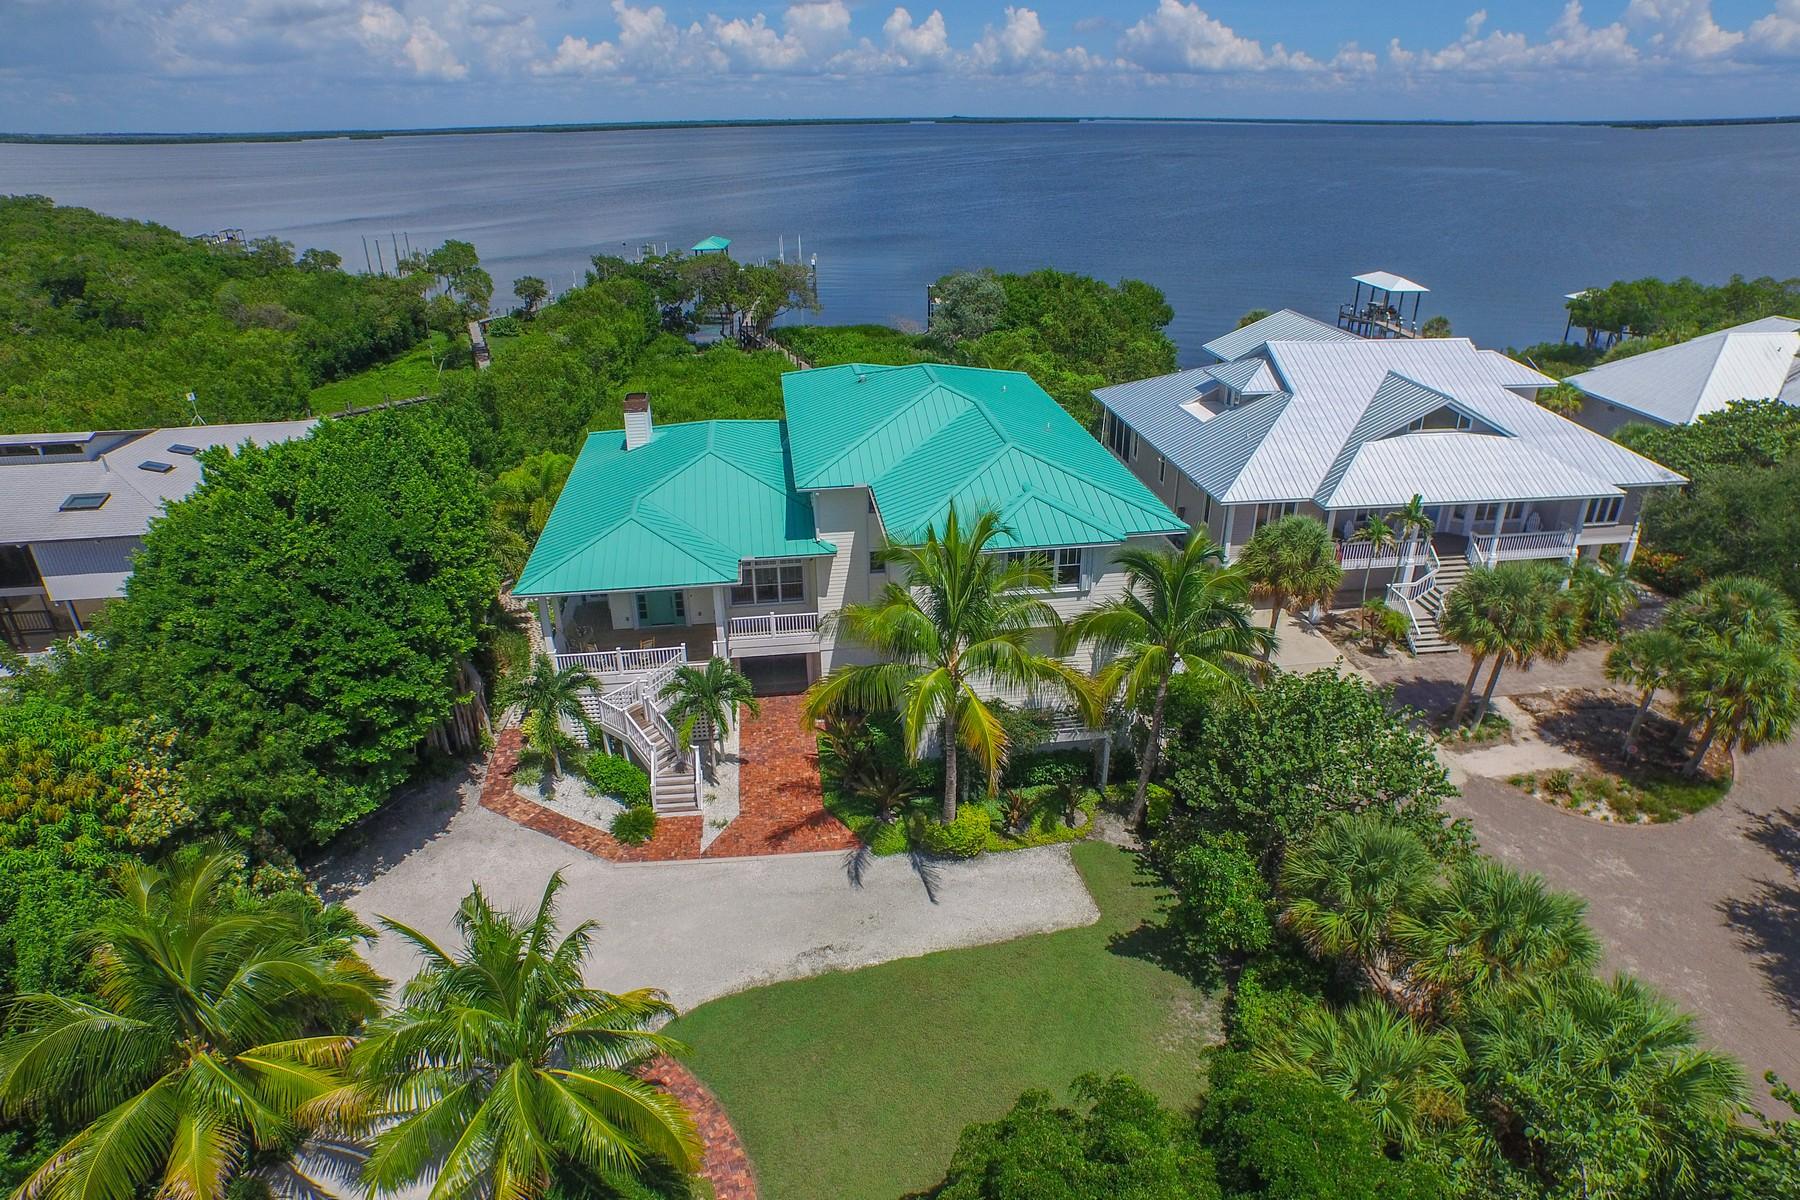 Single Family Home for Sale at 6 Peekins Cove Dr 6 Peekins Cove Dr. Boca Grande, Florida 33921 United States